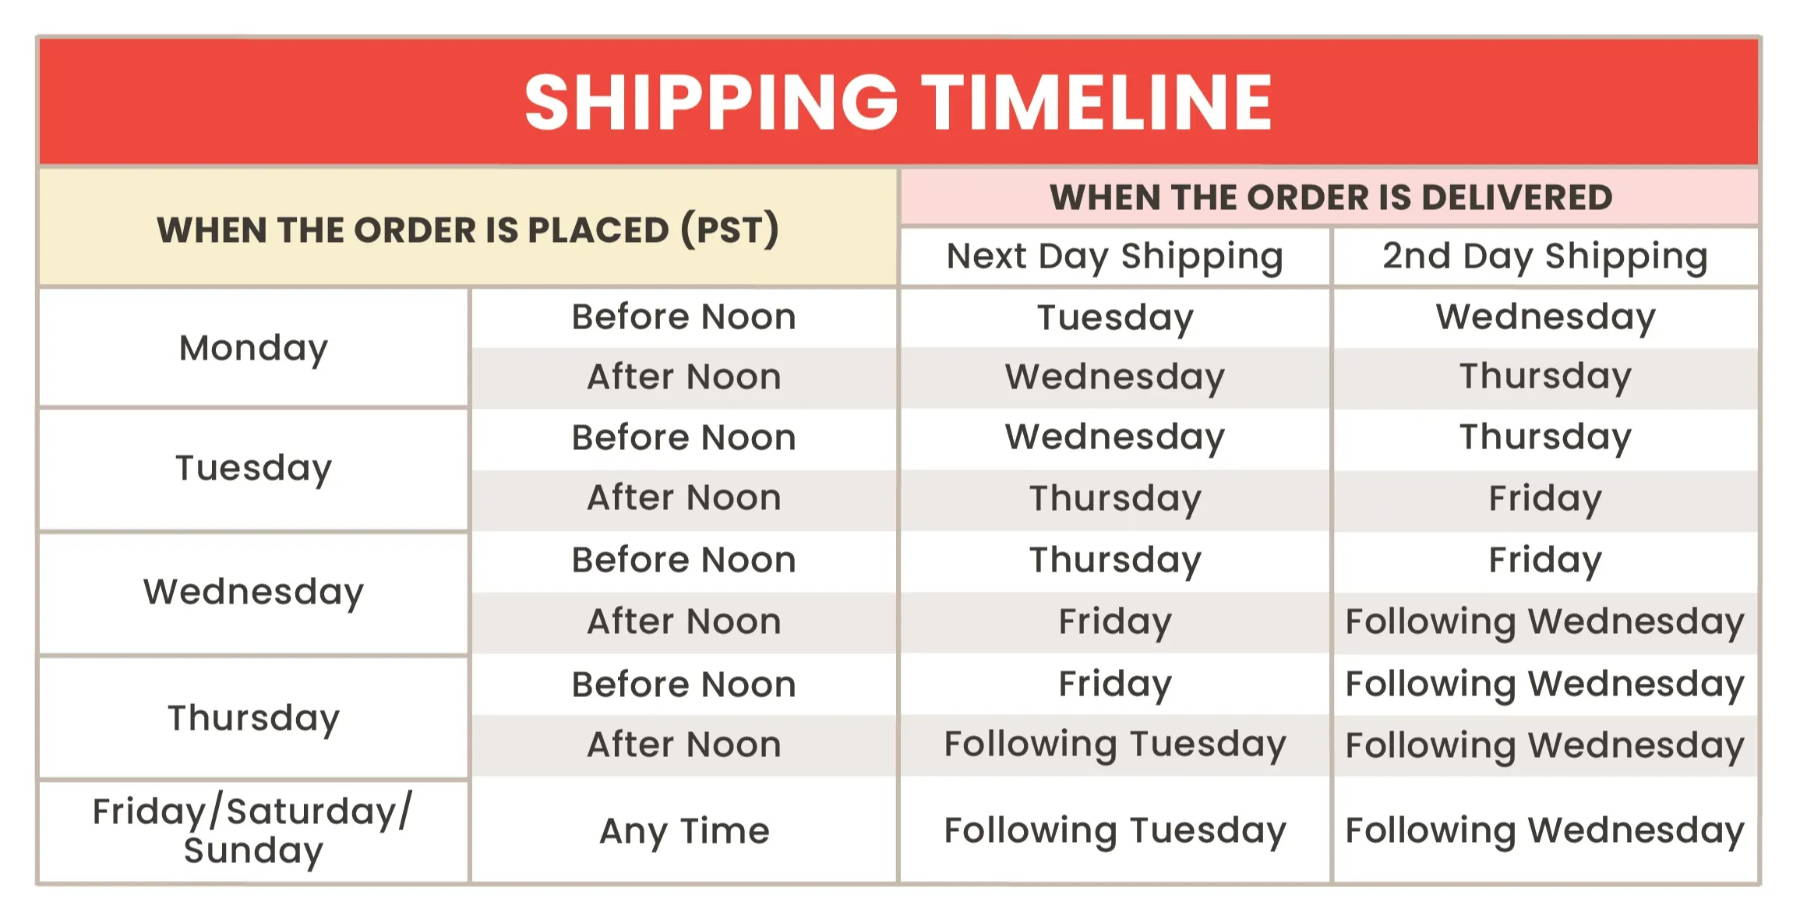 Salt & Straw Shipping Timeline